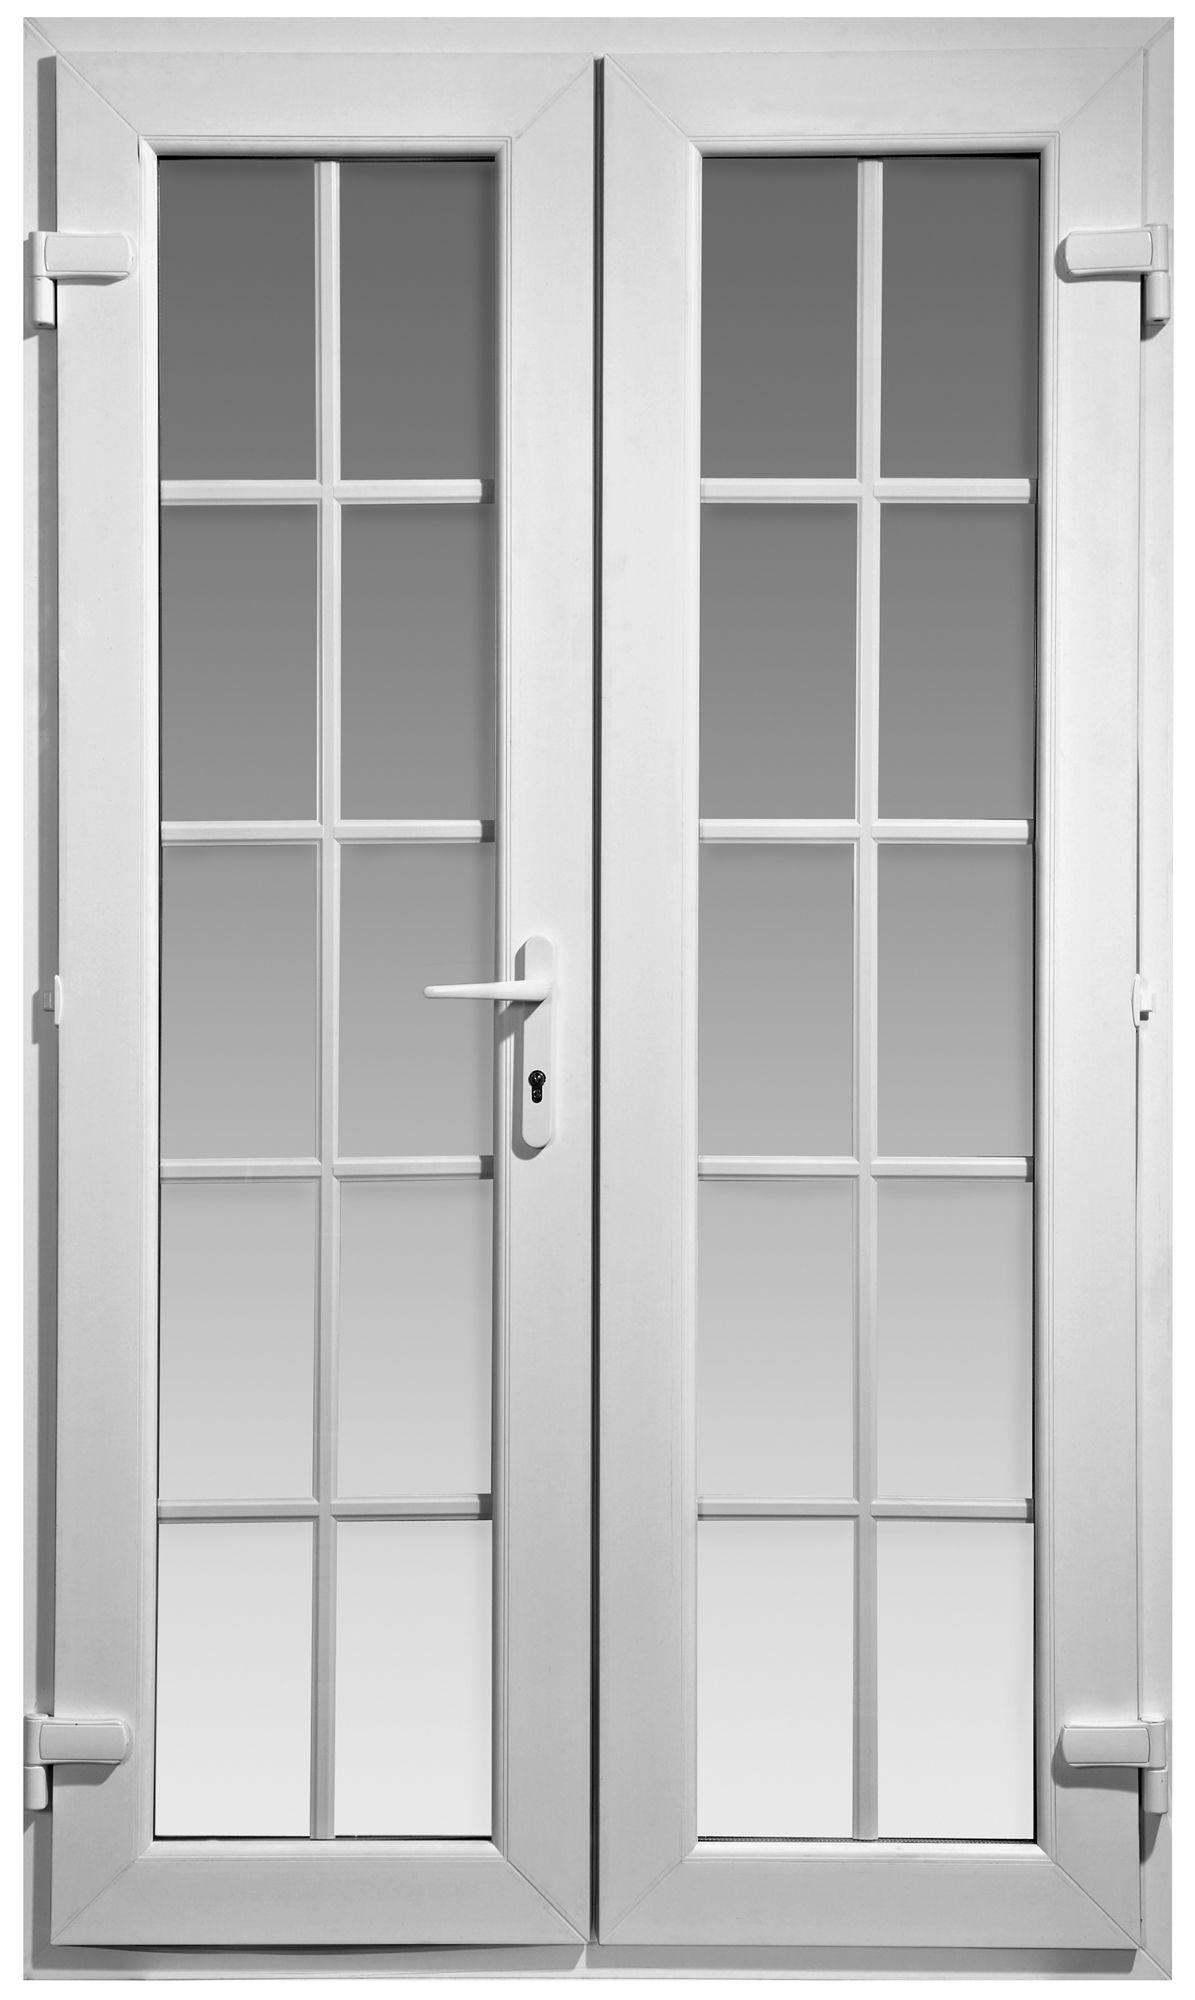 4ft Georgian Clear Glazed Pvcu External French Door Set, (h)2055mm (w)1190mm